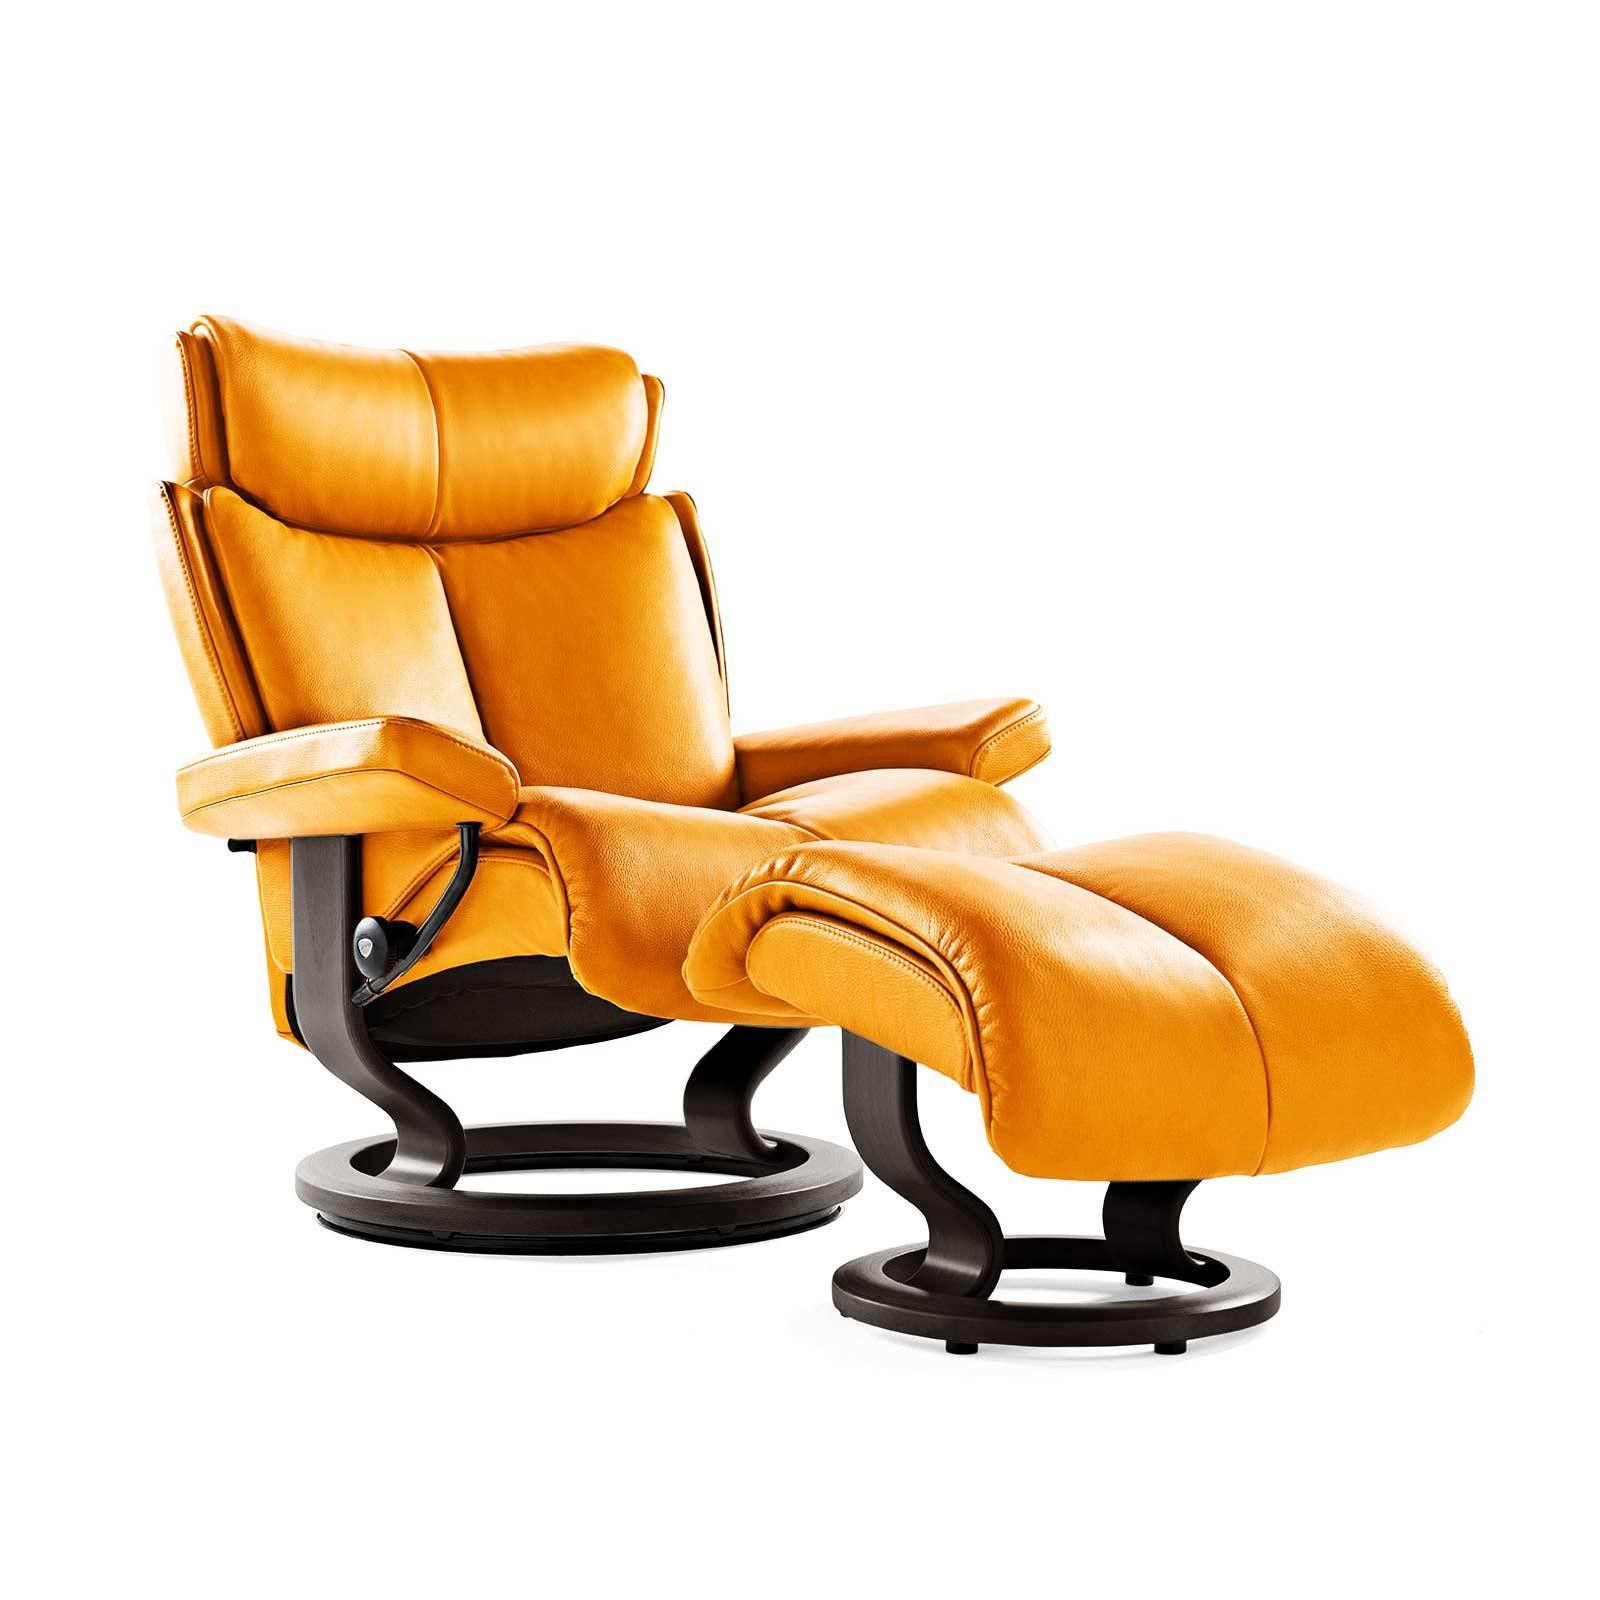 stressless sessel magic paloma clementine mit hocker stressless. Black Bedroom Furniture Sets. Home Design Ideas